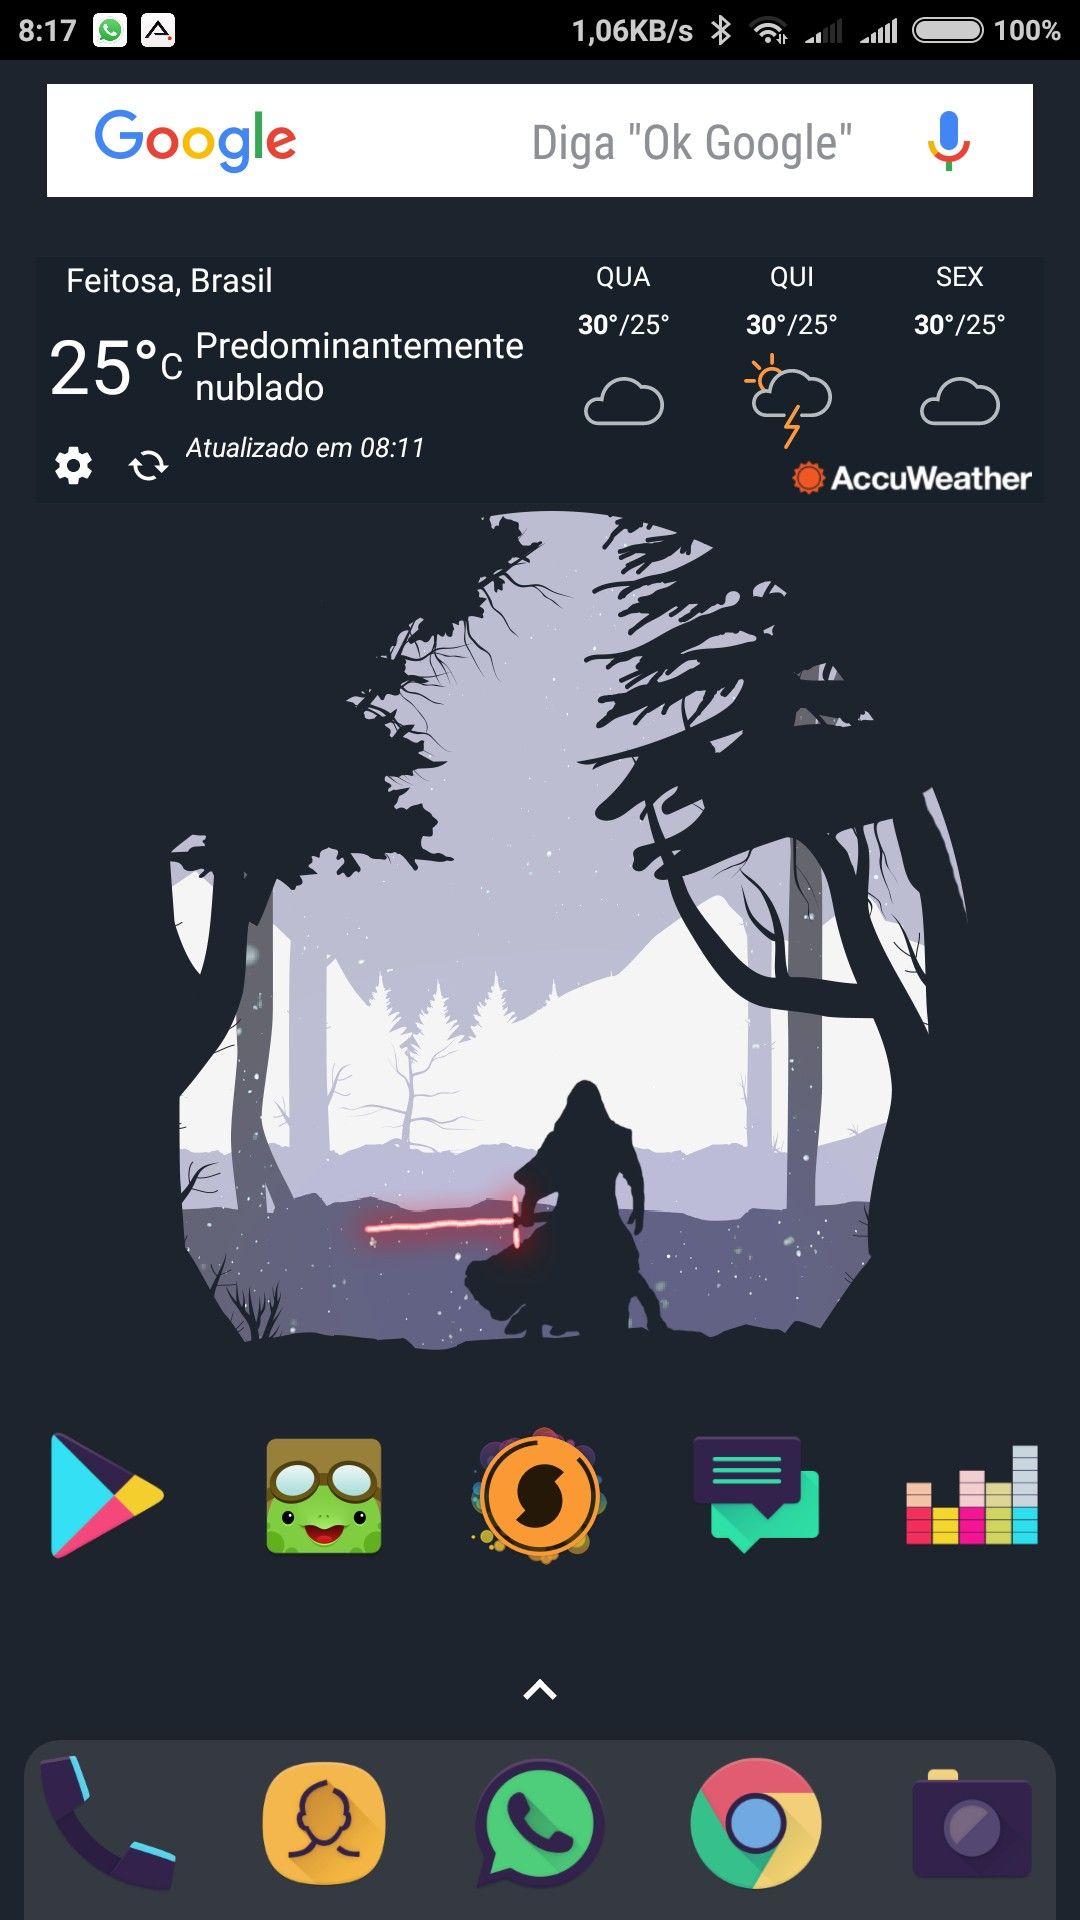 Nova Launcher + Viral icon pack + Kylo Ren Wallpaper